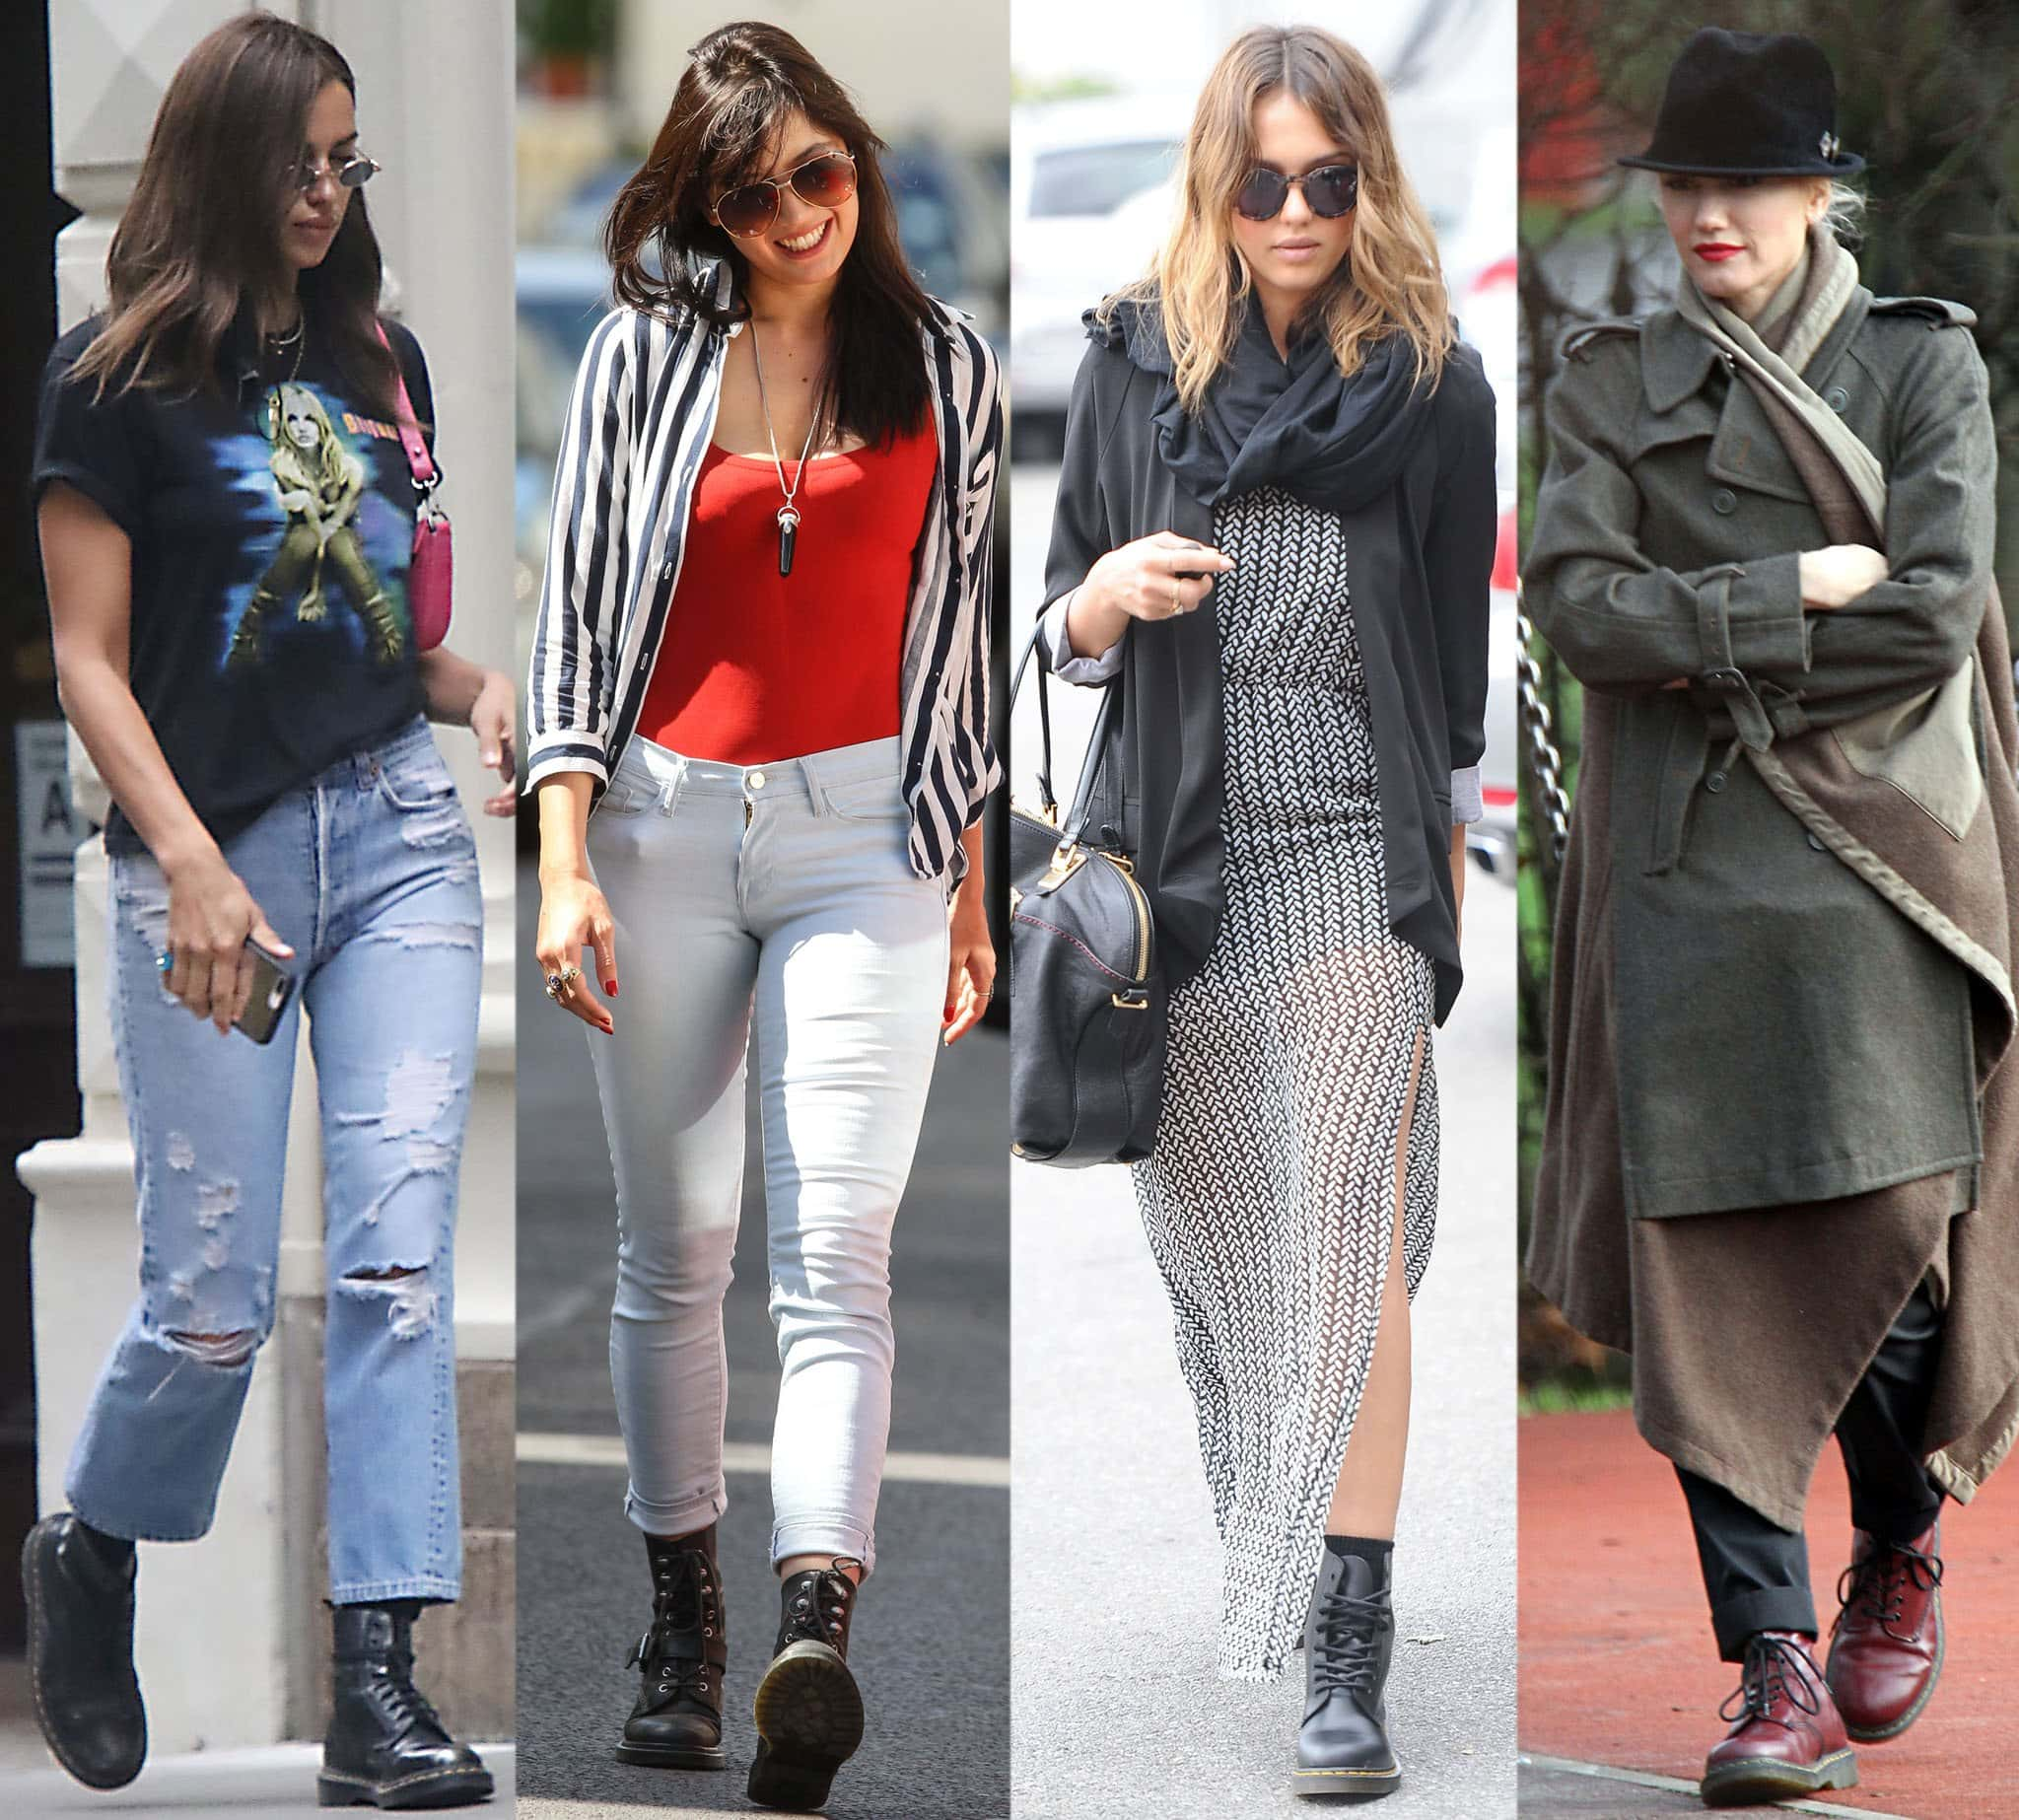 Irina Shayk, Daisy Lowe, Jessica Alba, and Gwen Stefani in Dr. Martens boots